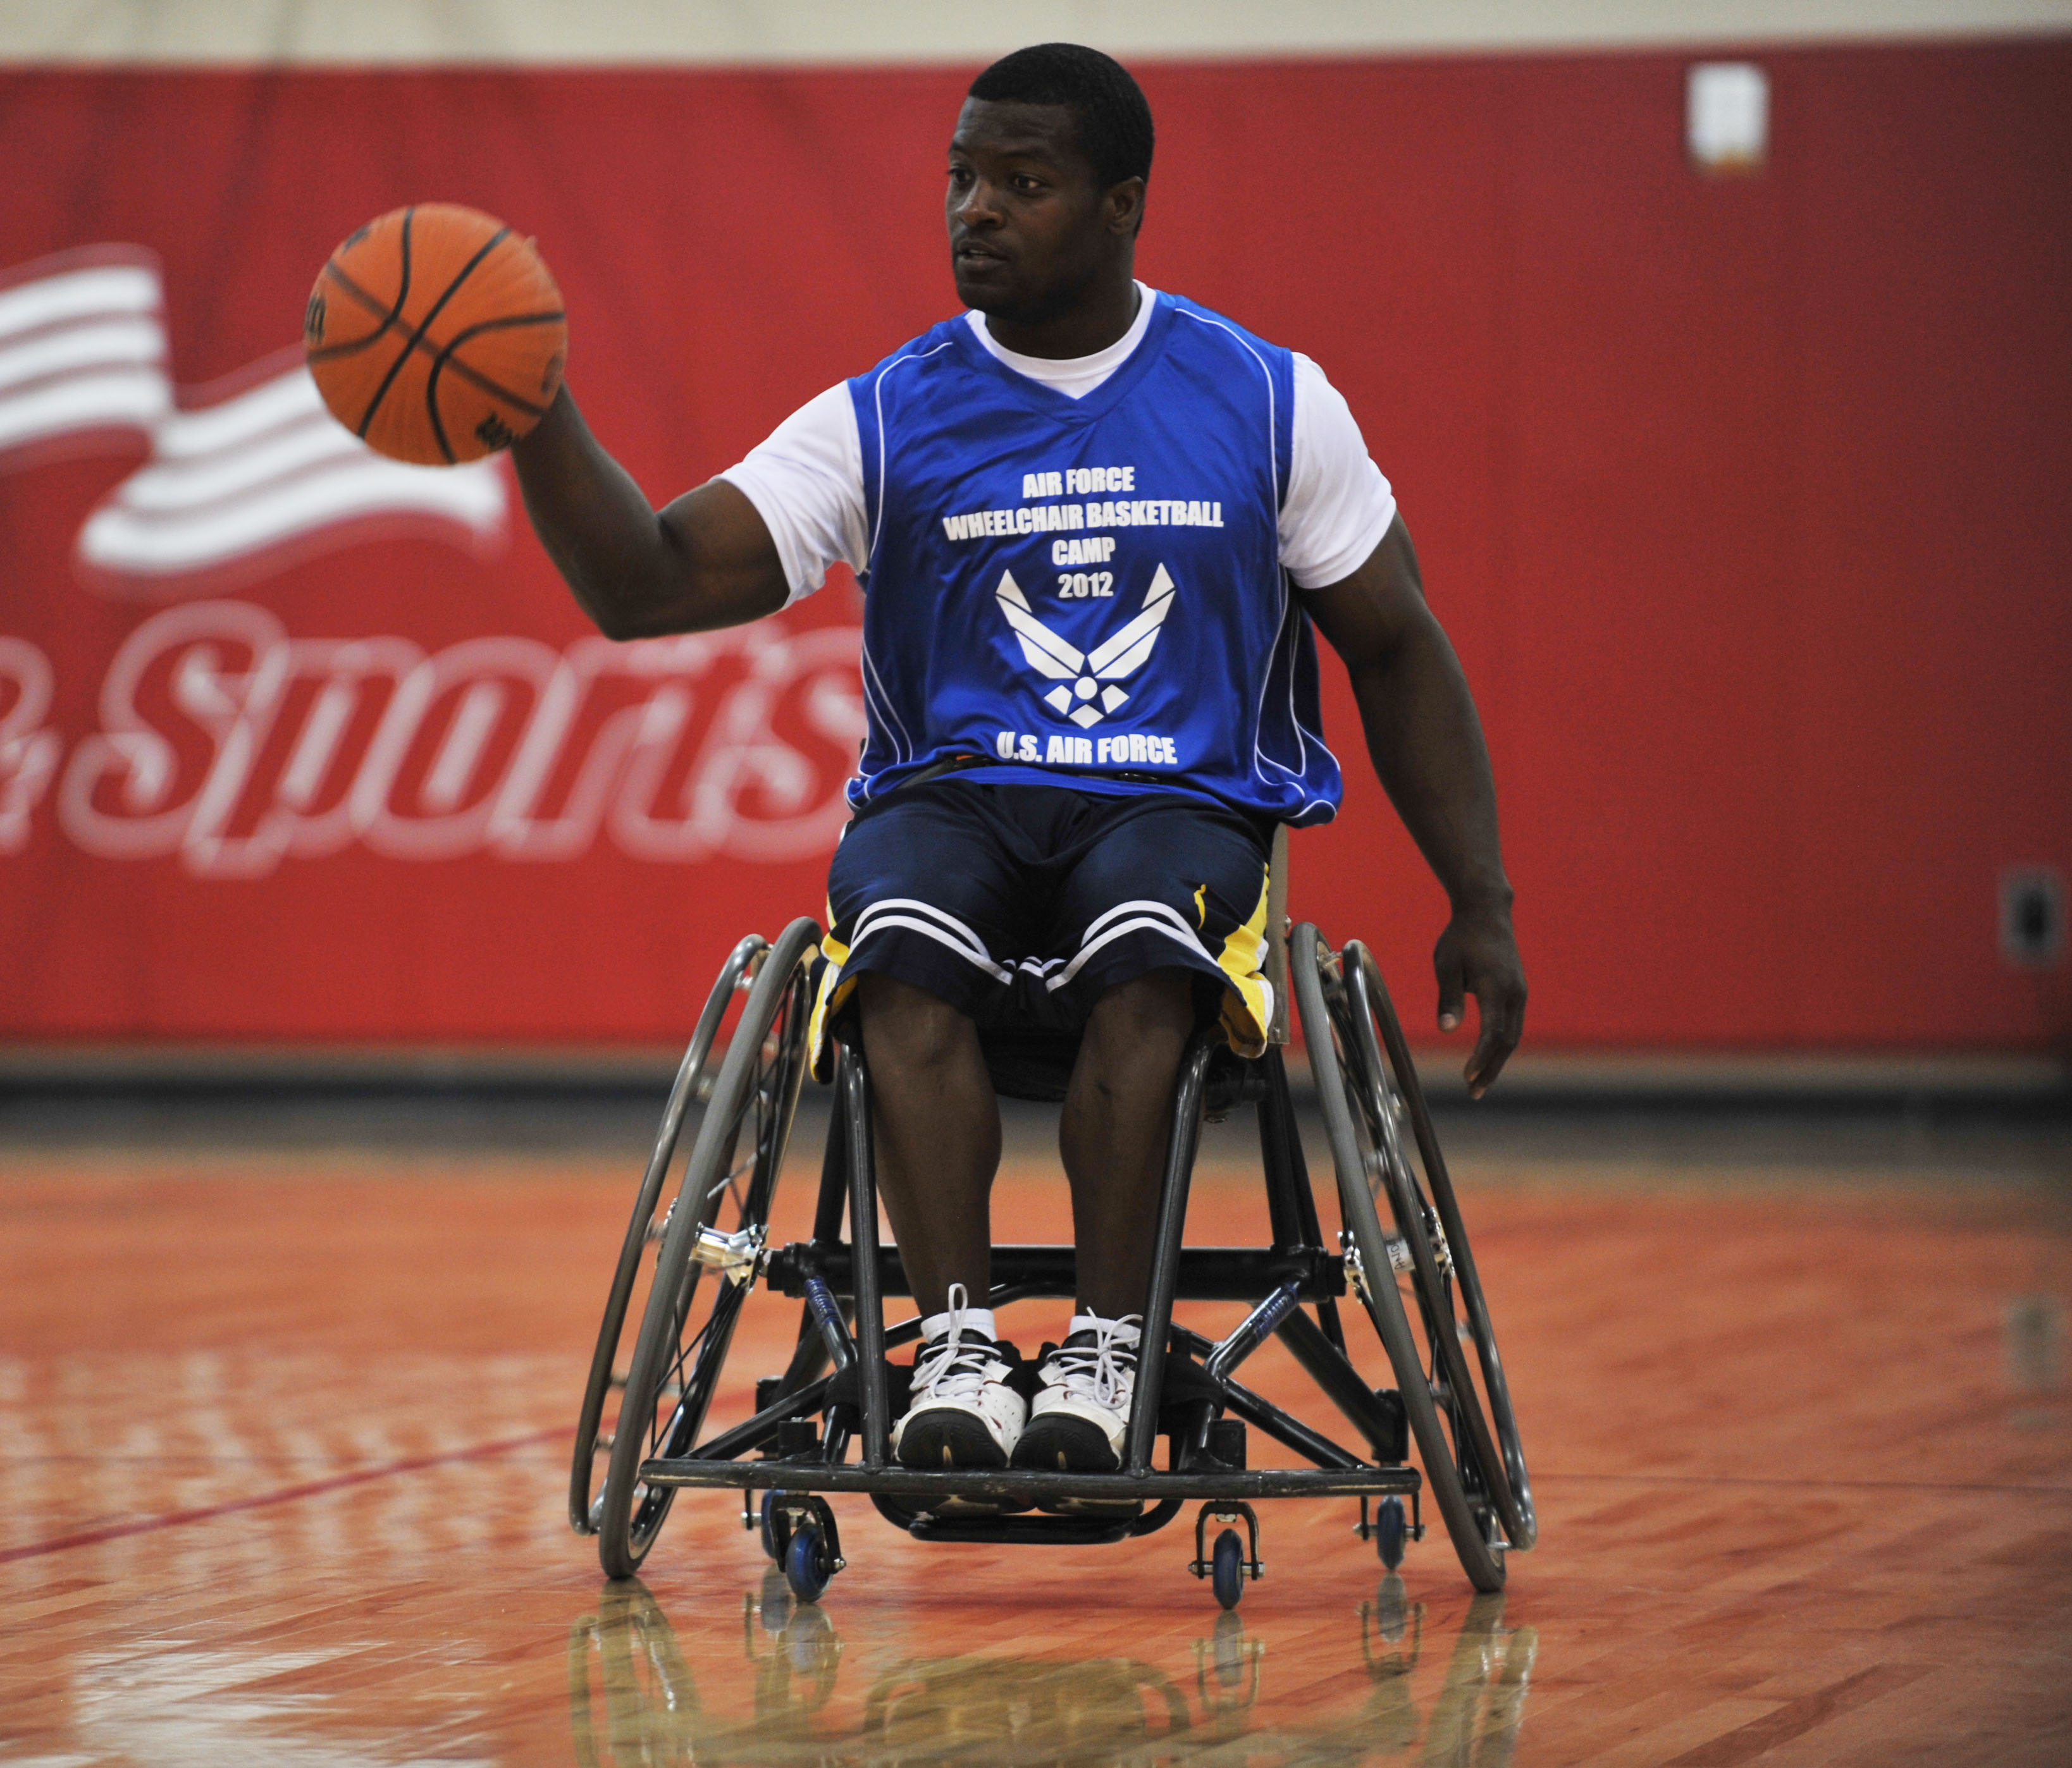 Basketball Camps Clinics Denver Youth Sports: Photos